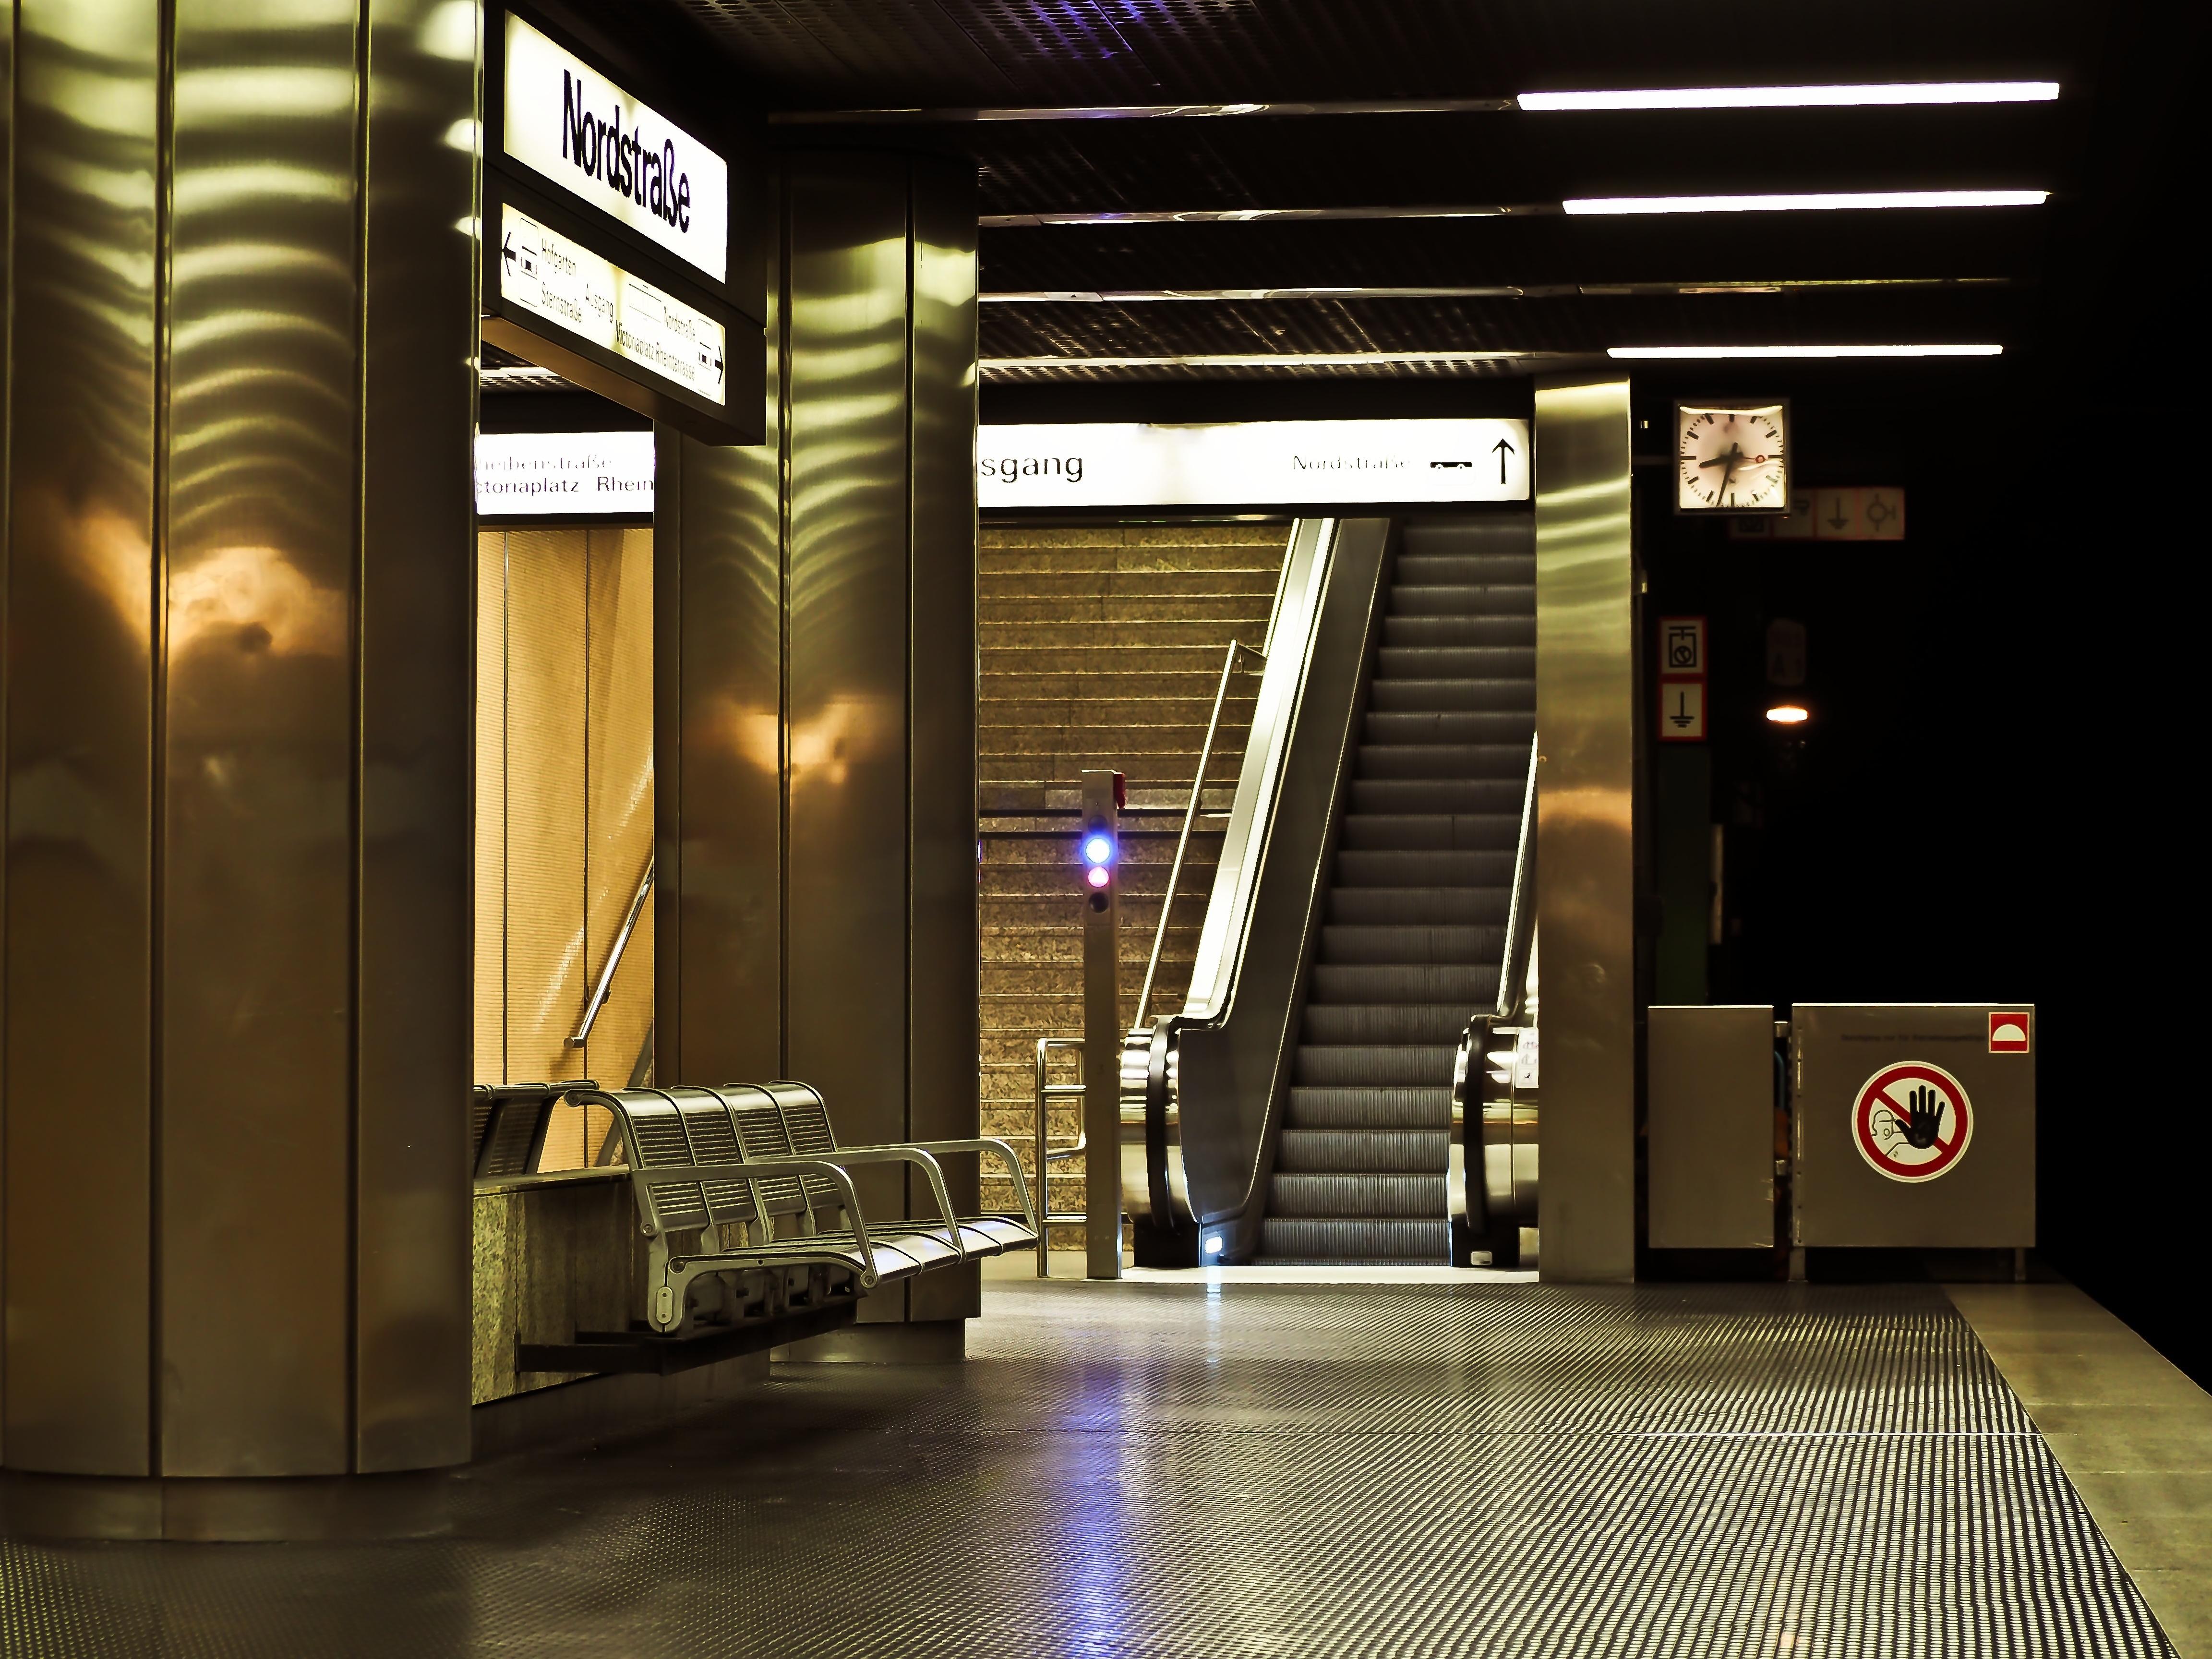 Design Düsseldorf free images city escalator subway metro platform